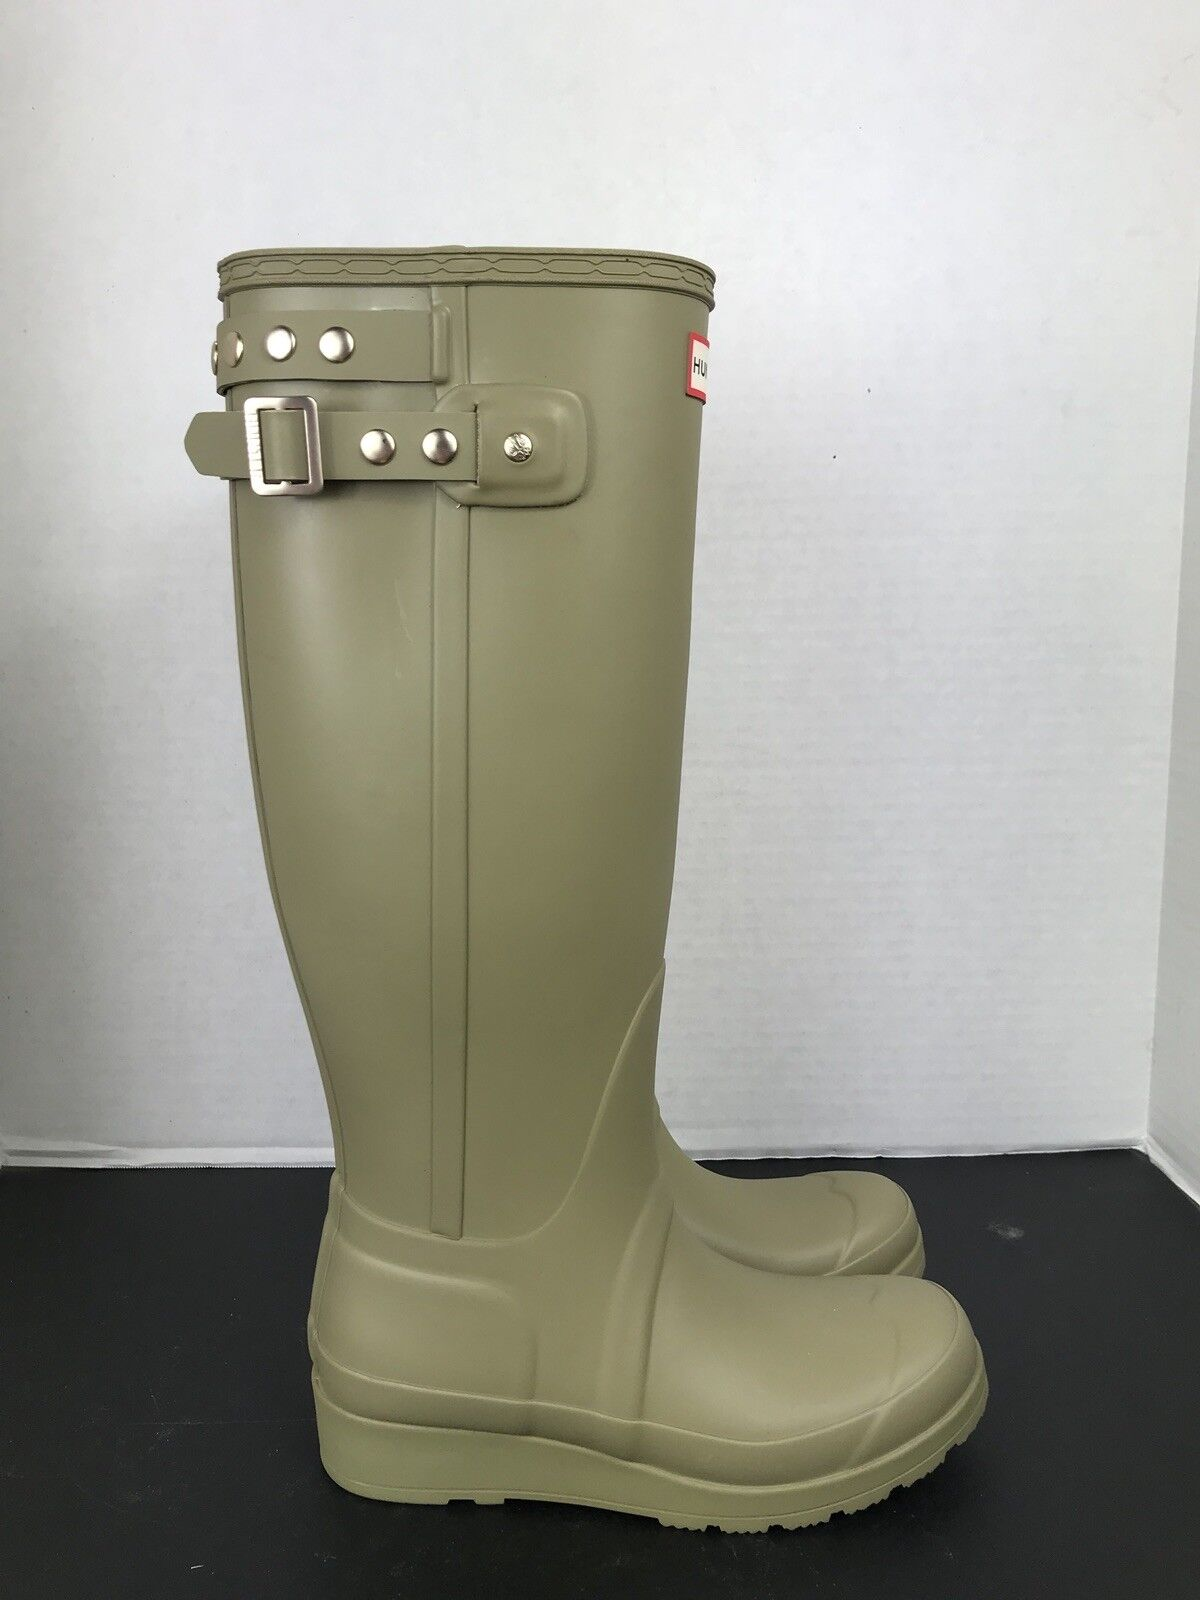 Hunter Original Tall Studded Wedge Rain Boot, Sage SZ 5US 5US 5US 36EU 2ce404